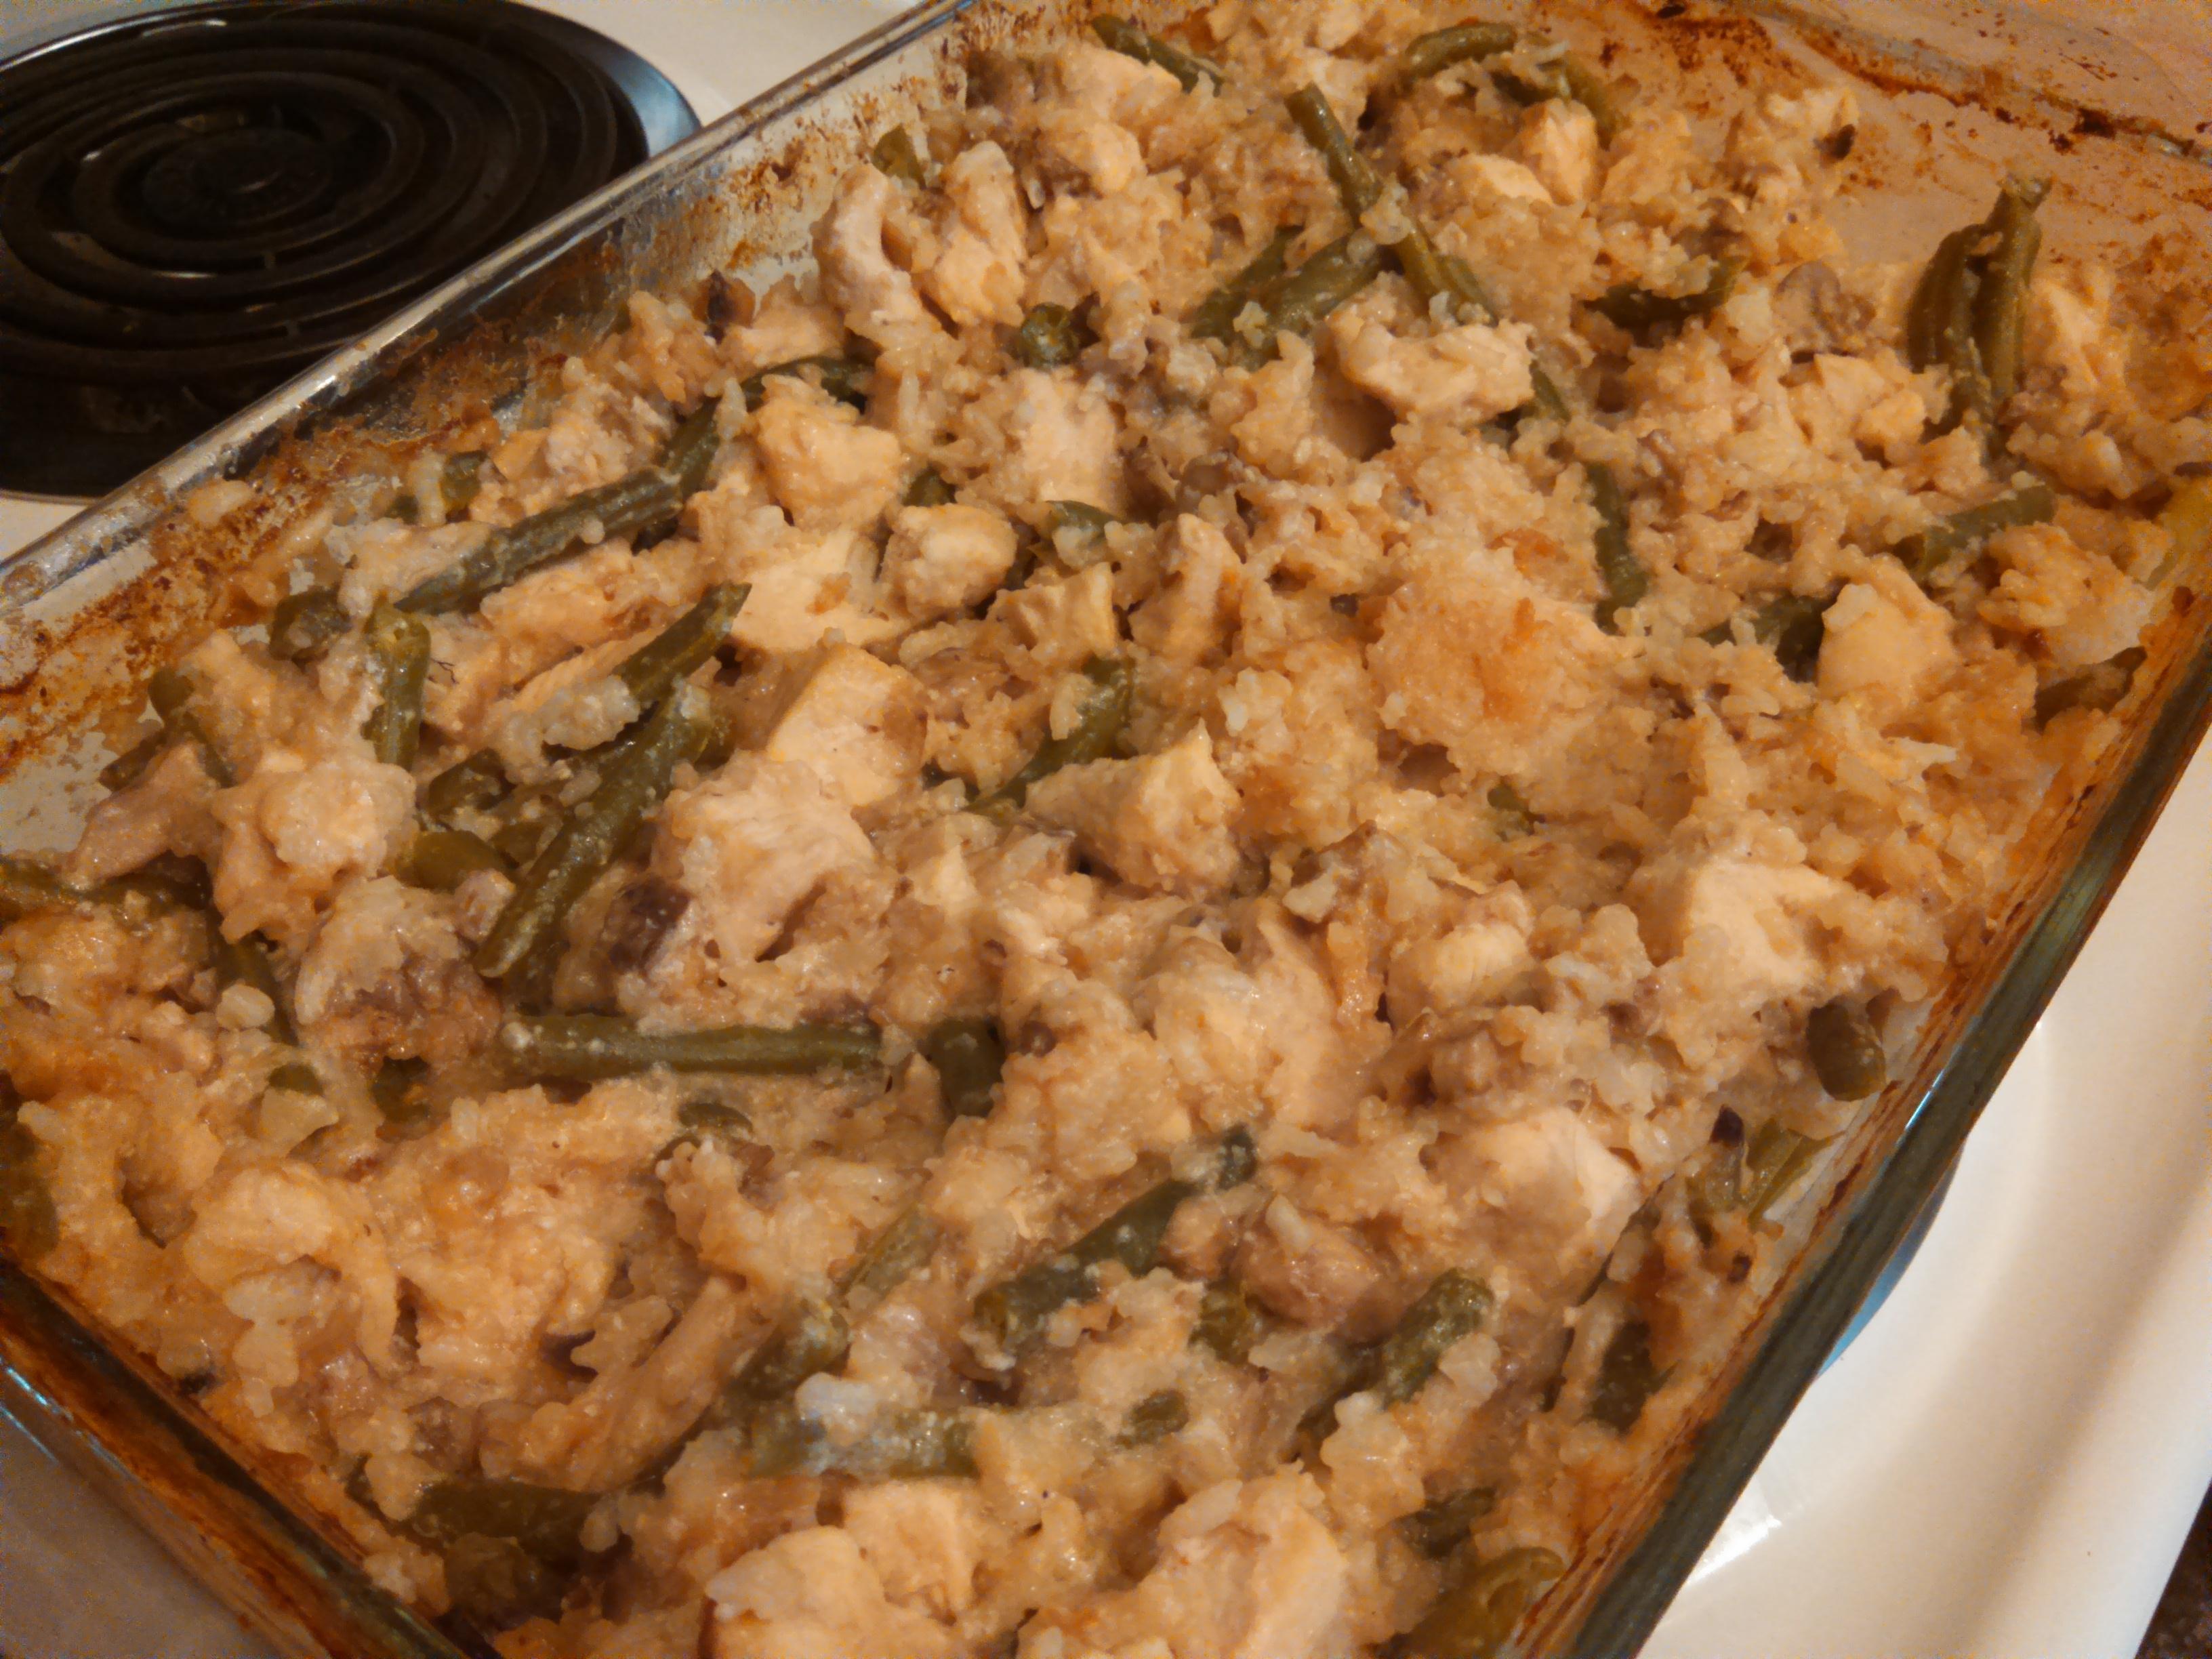 Creamy Mushroom, Green Bean, Chicken, and Rice Casserole